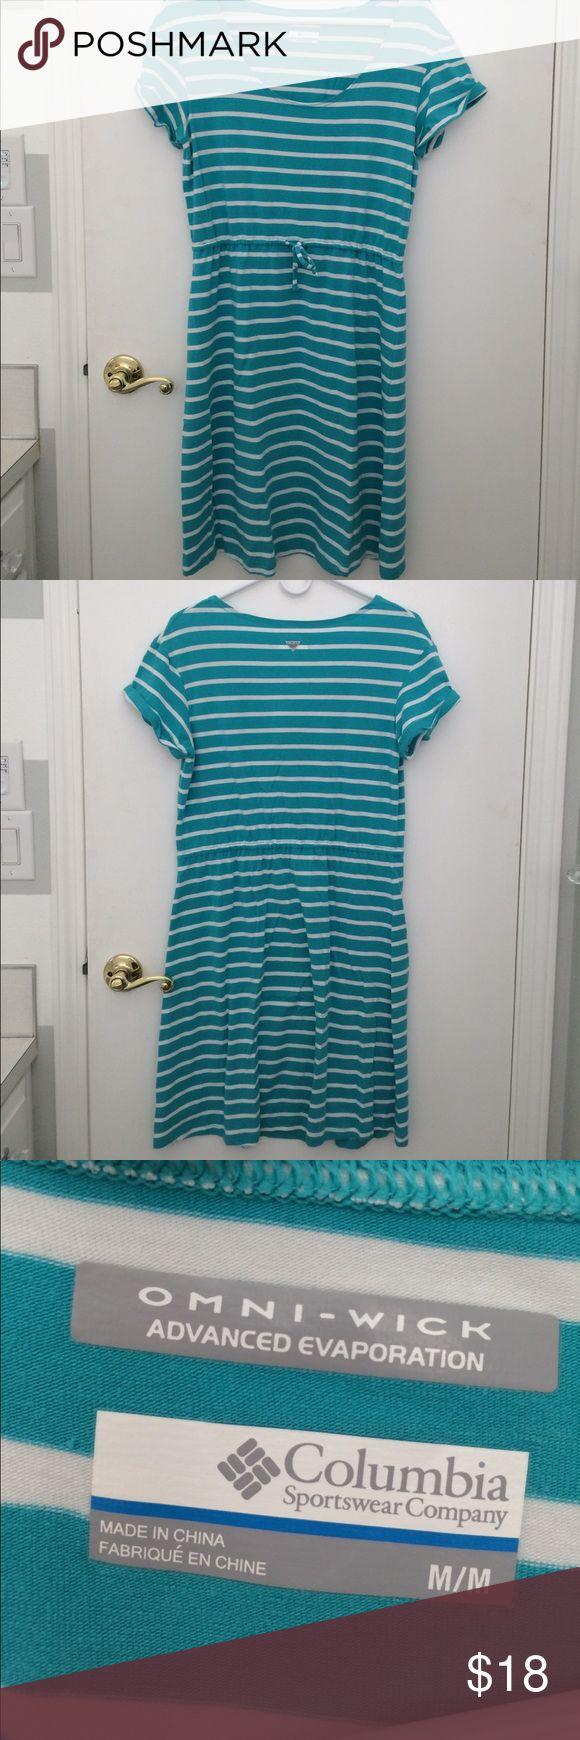 Columbia Sportswear Omni Wick Dress Size M Columbia Sportswear Omni Wick Dress Size M.  Teal and white stripes with a drawstring waist. From a smoke free/ pet free home. Columbia Dresses